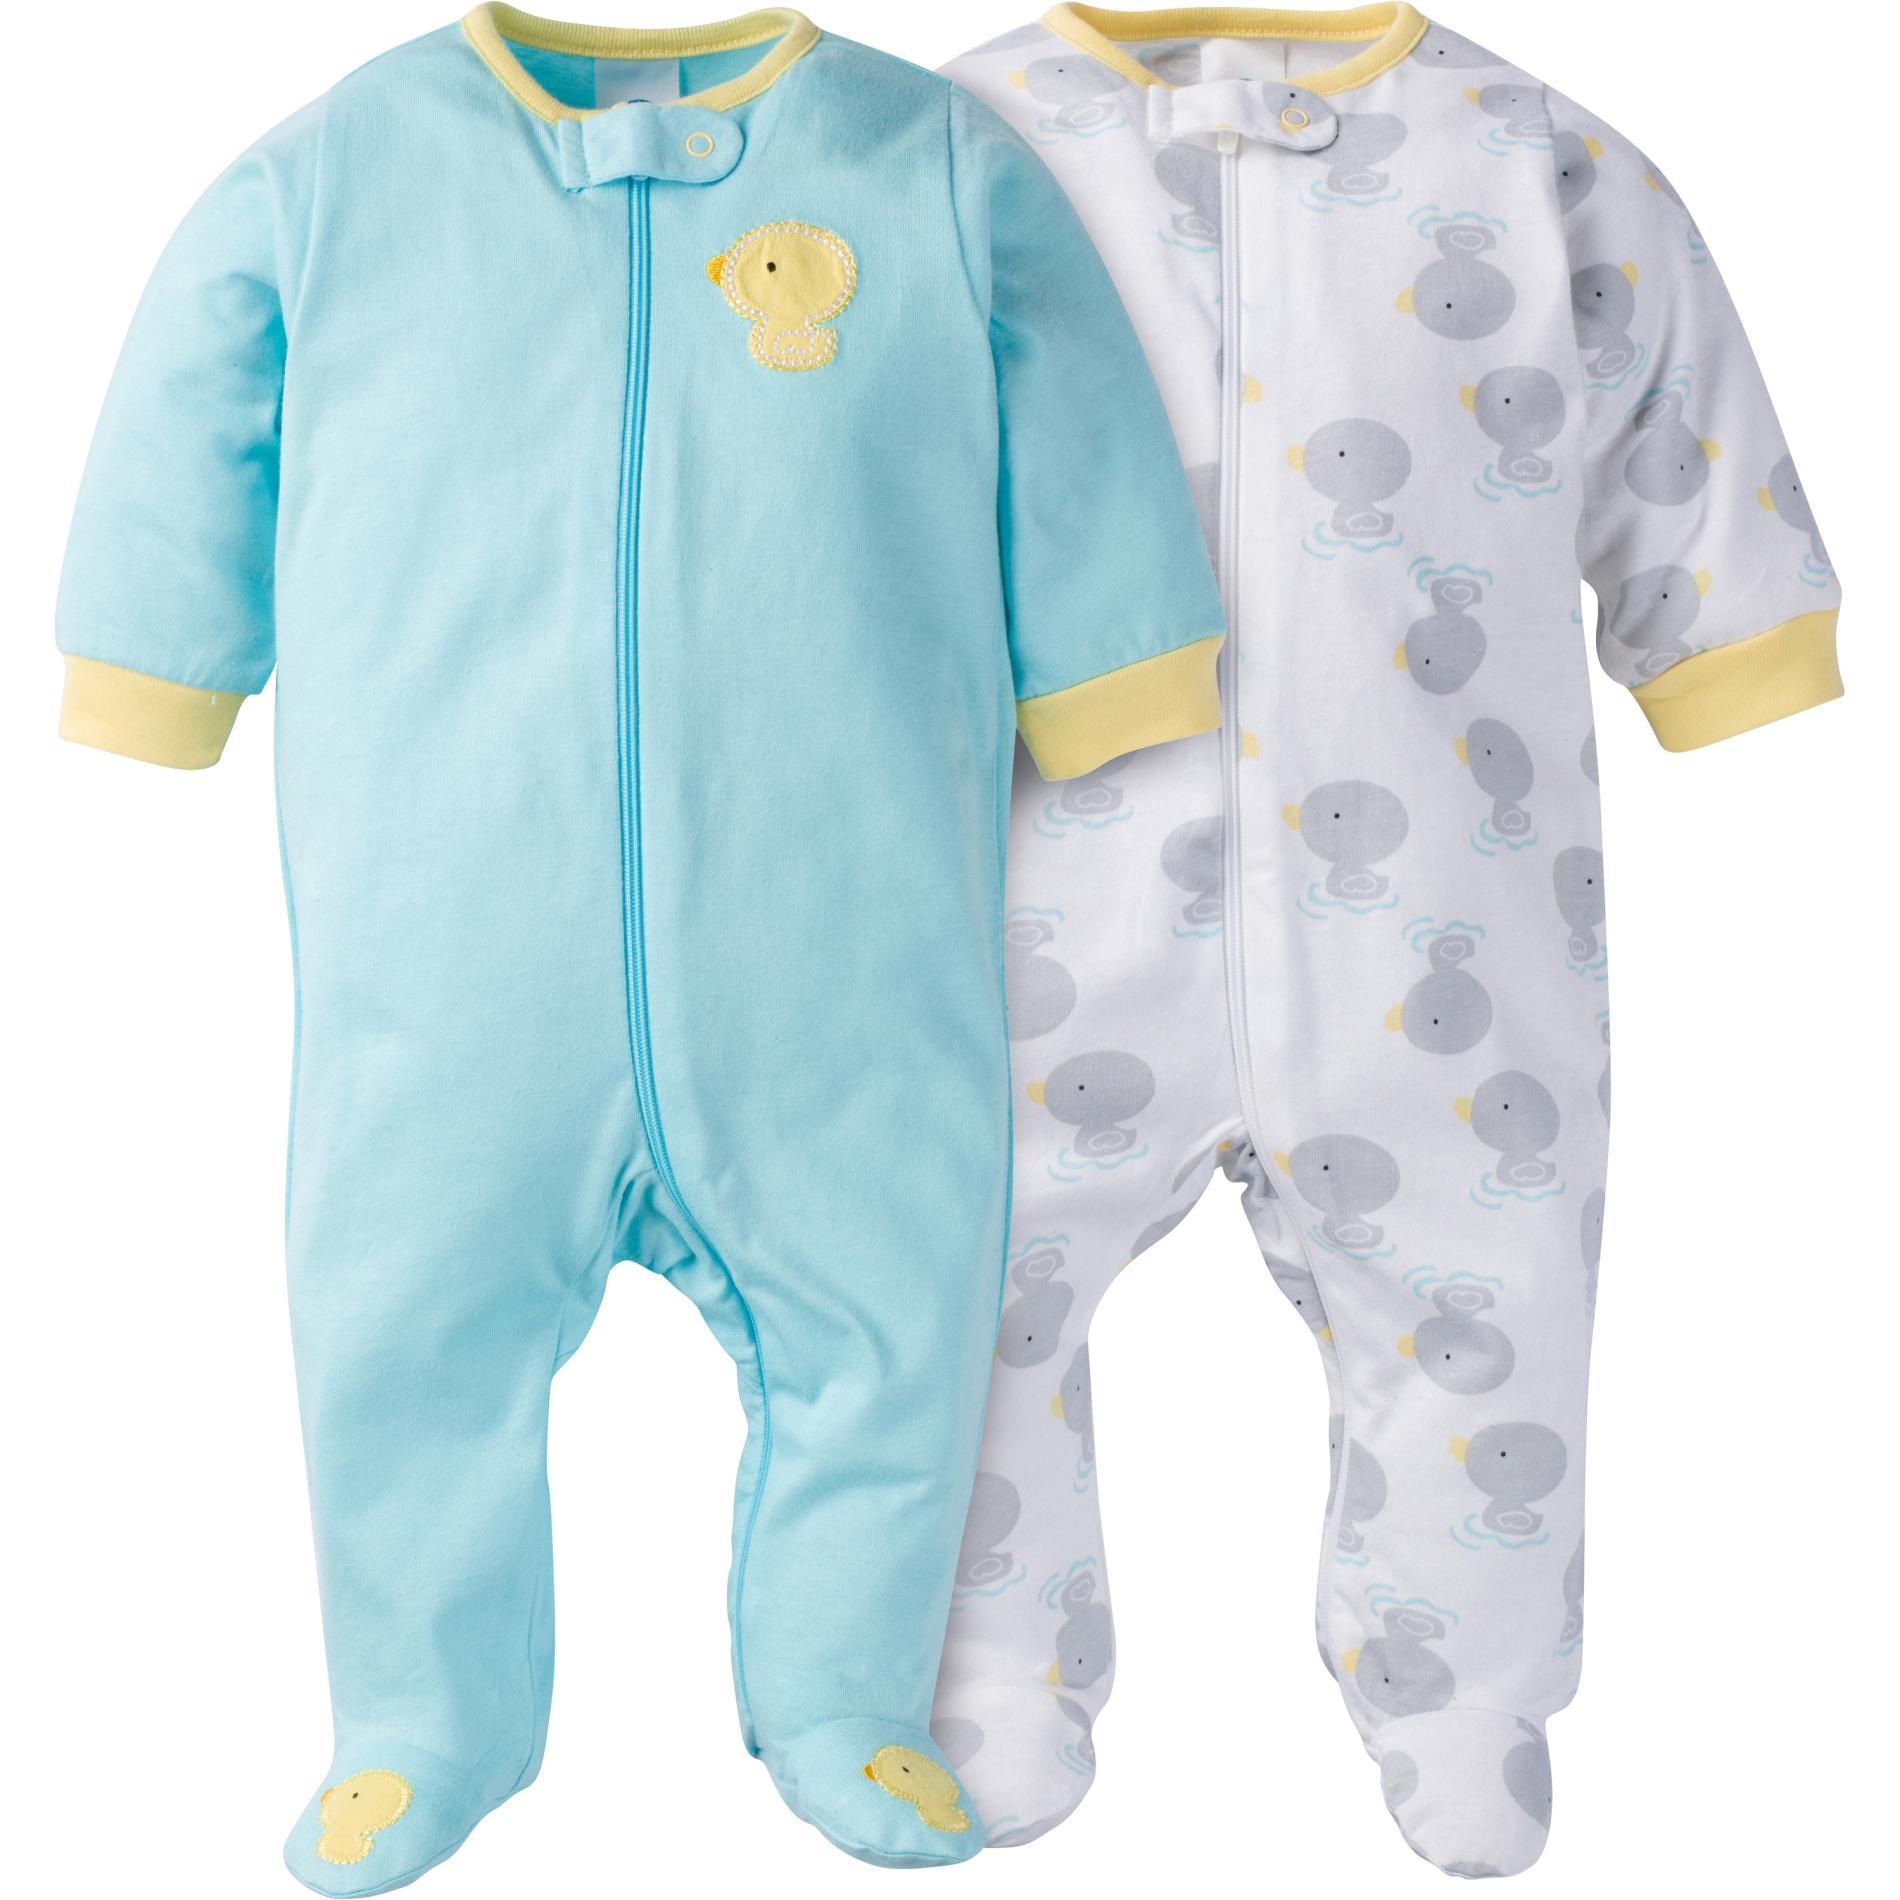 c5e9792f4f61 Gerber Newborn s 2-Pack Sleeper Pajamas - Ducks